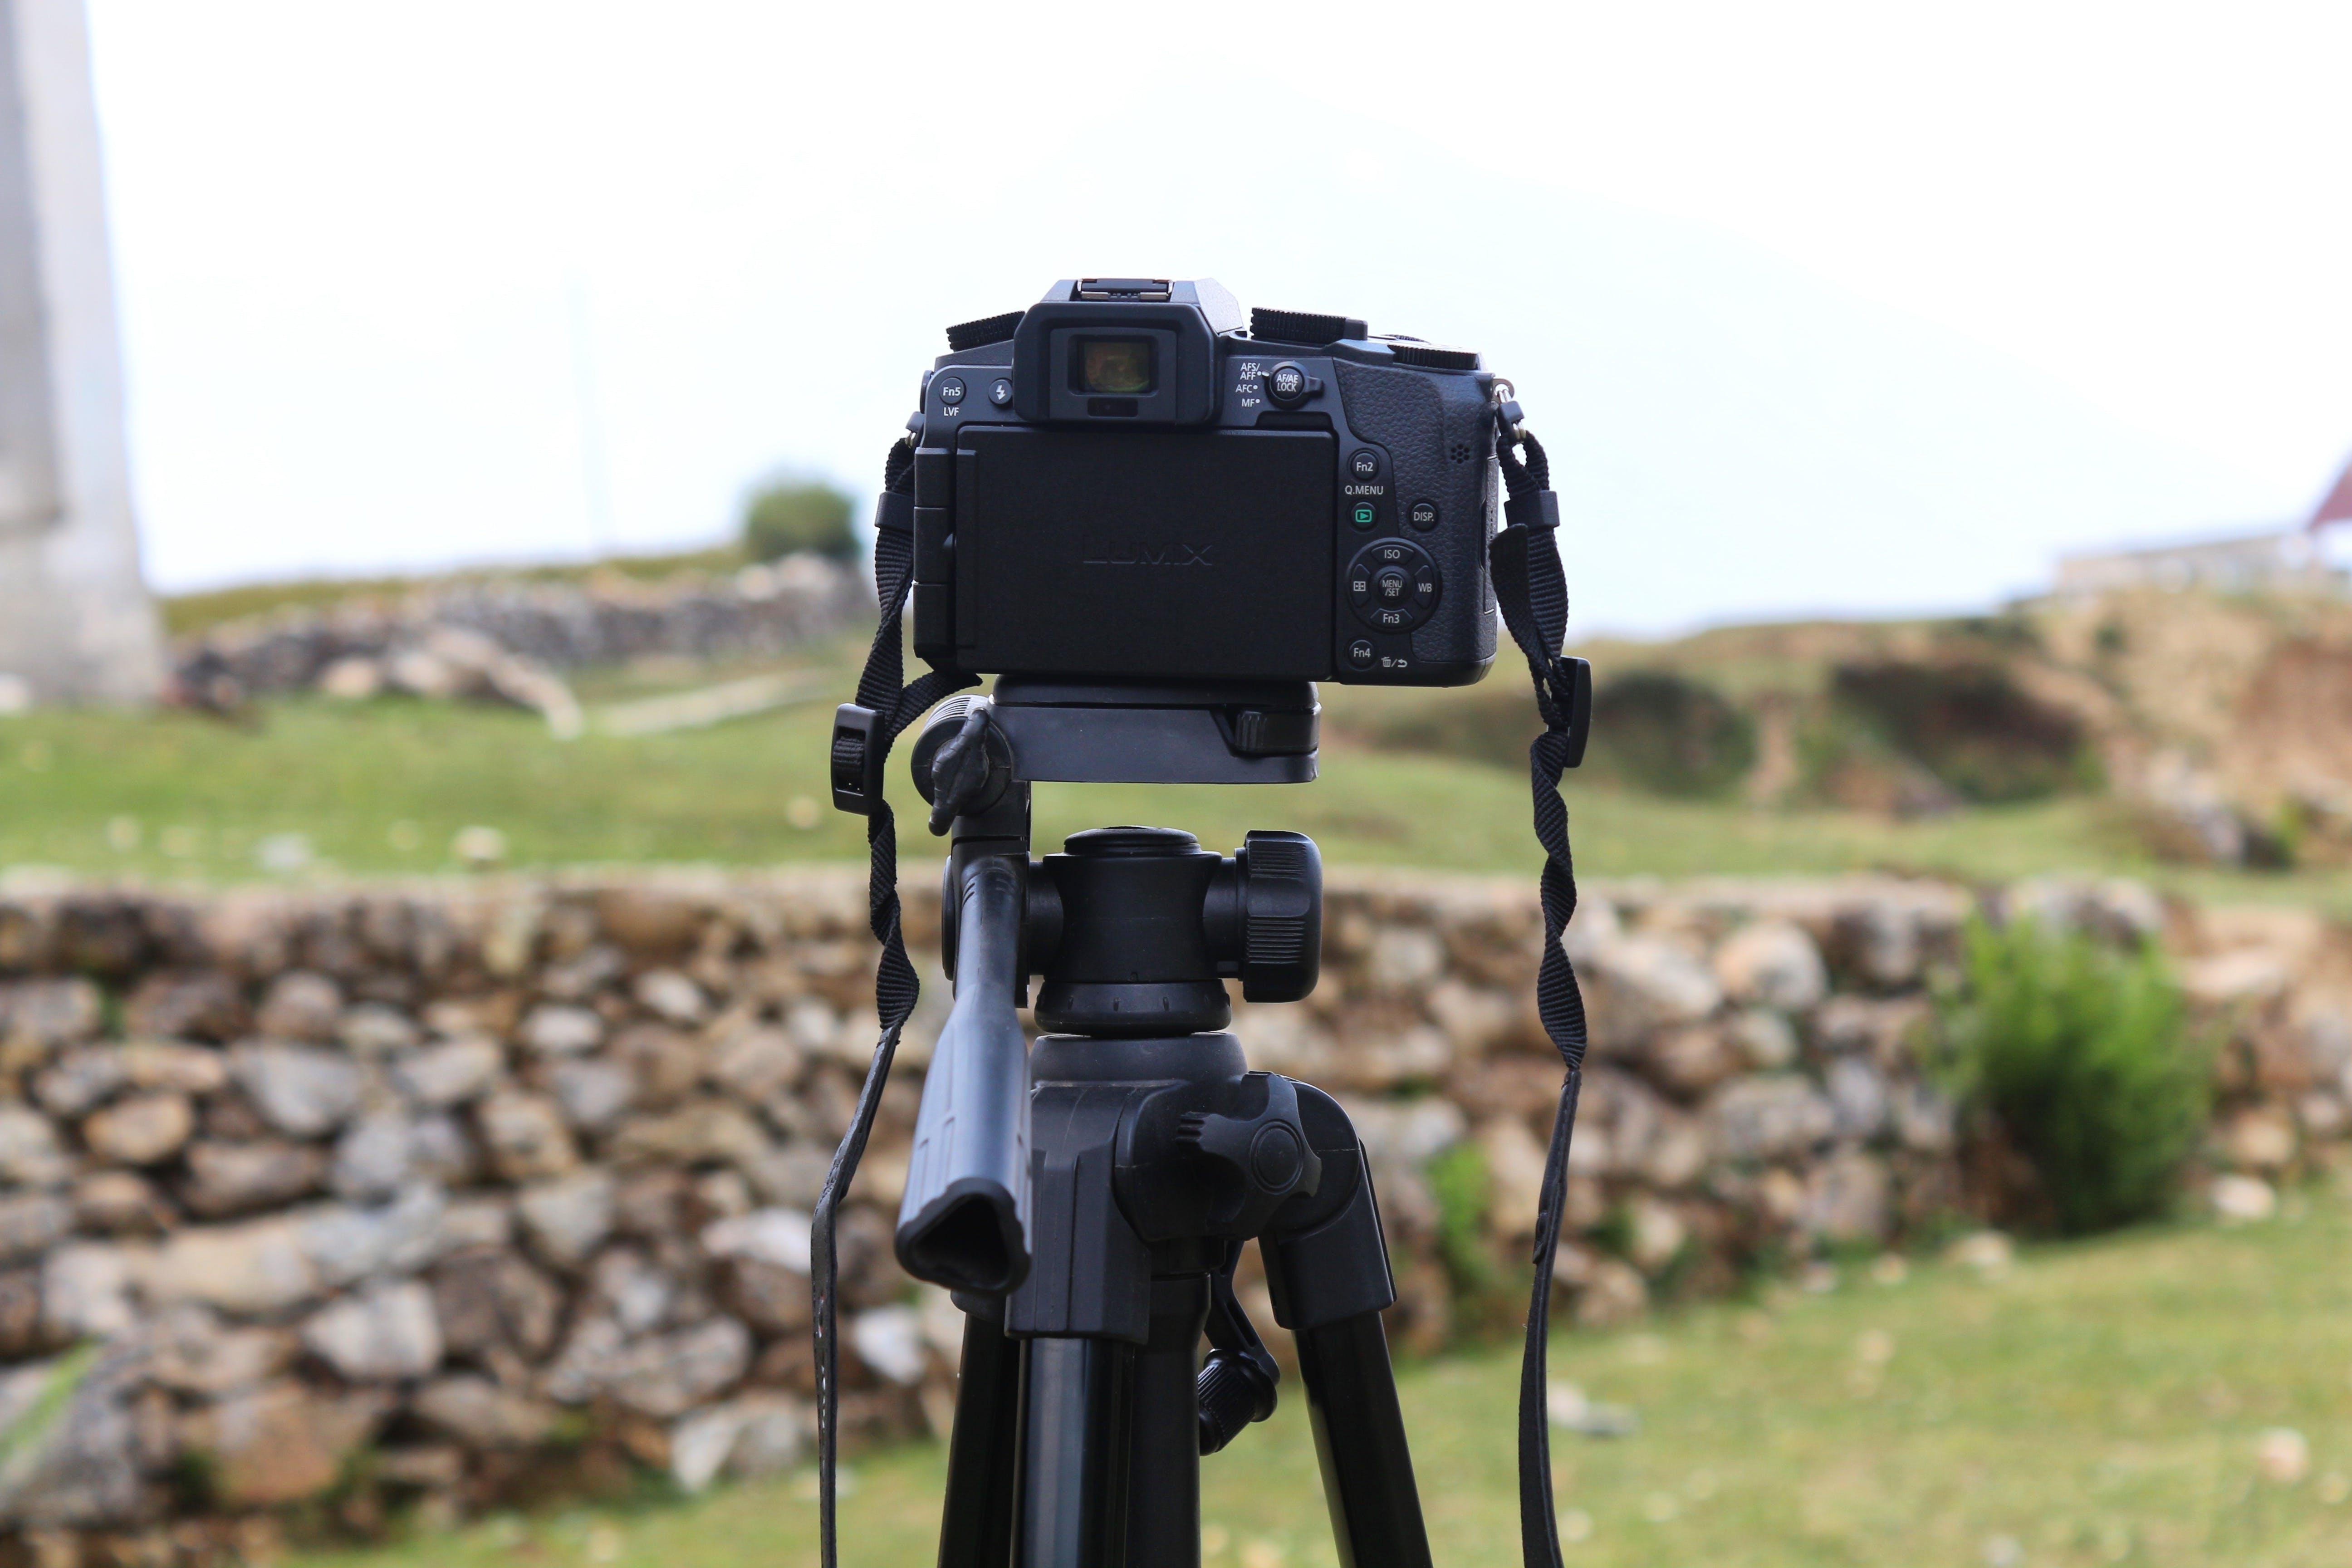 Free stock photo of camera, dslr, equipment, lens